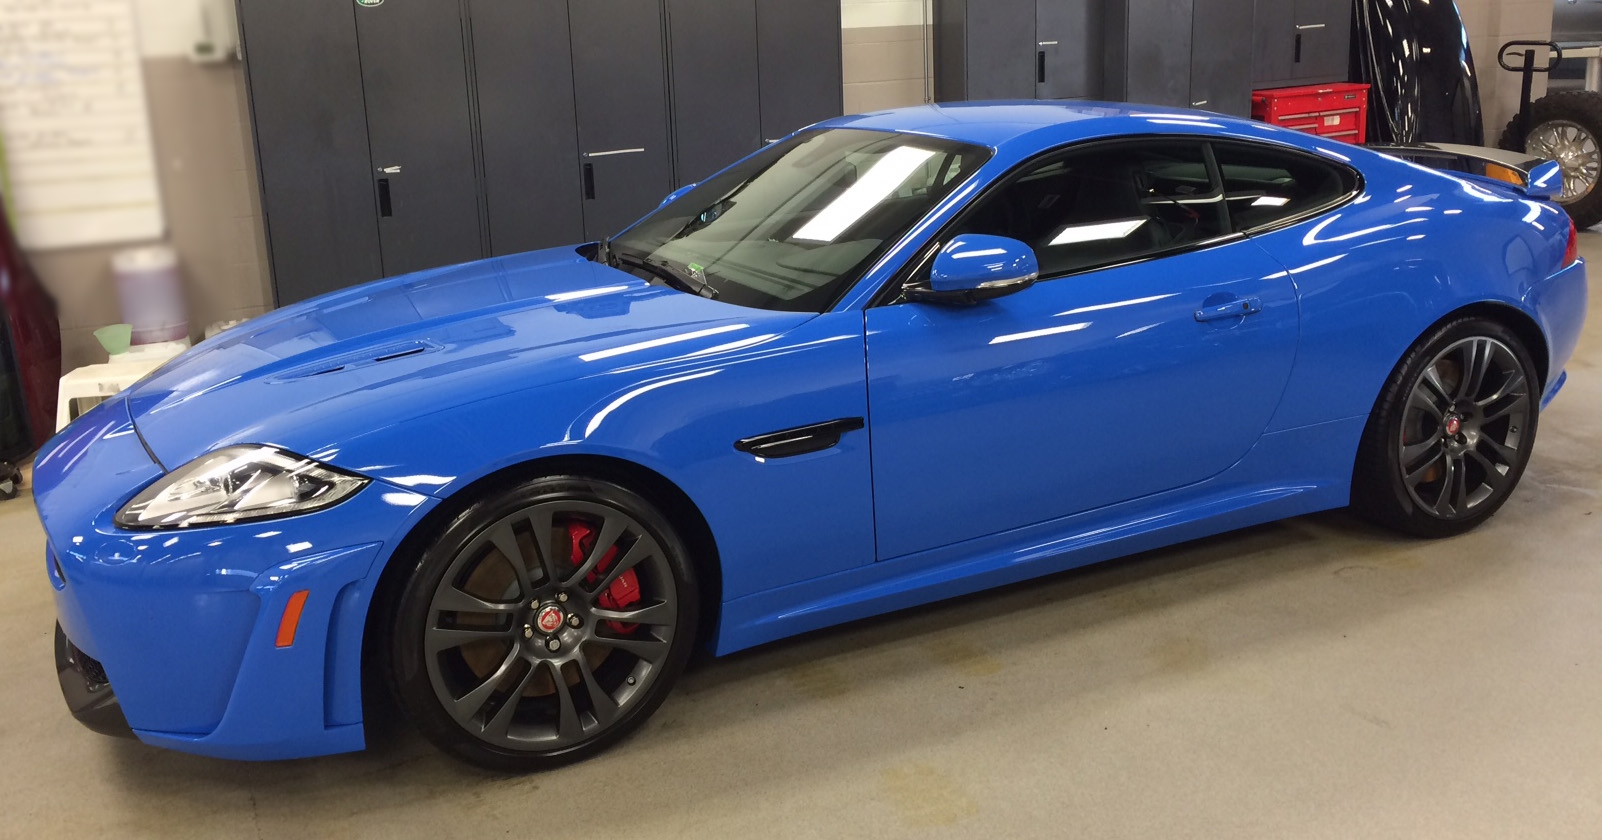 Stolen Luxury Sports Car Located In Regina